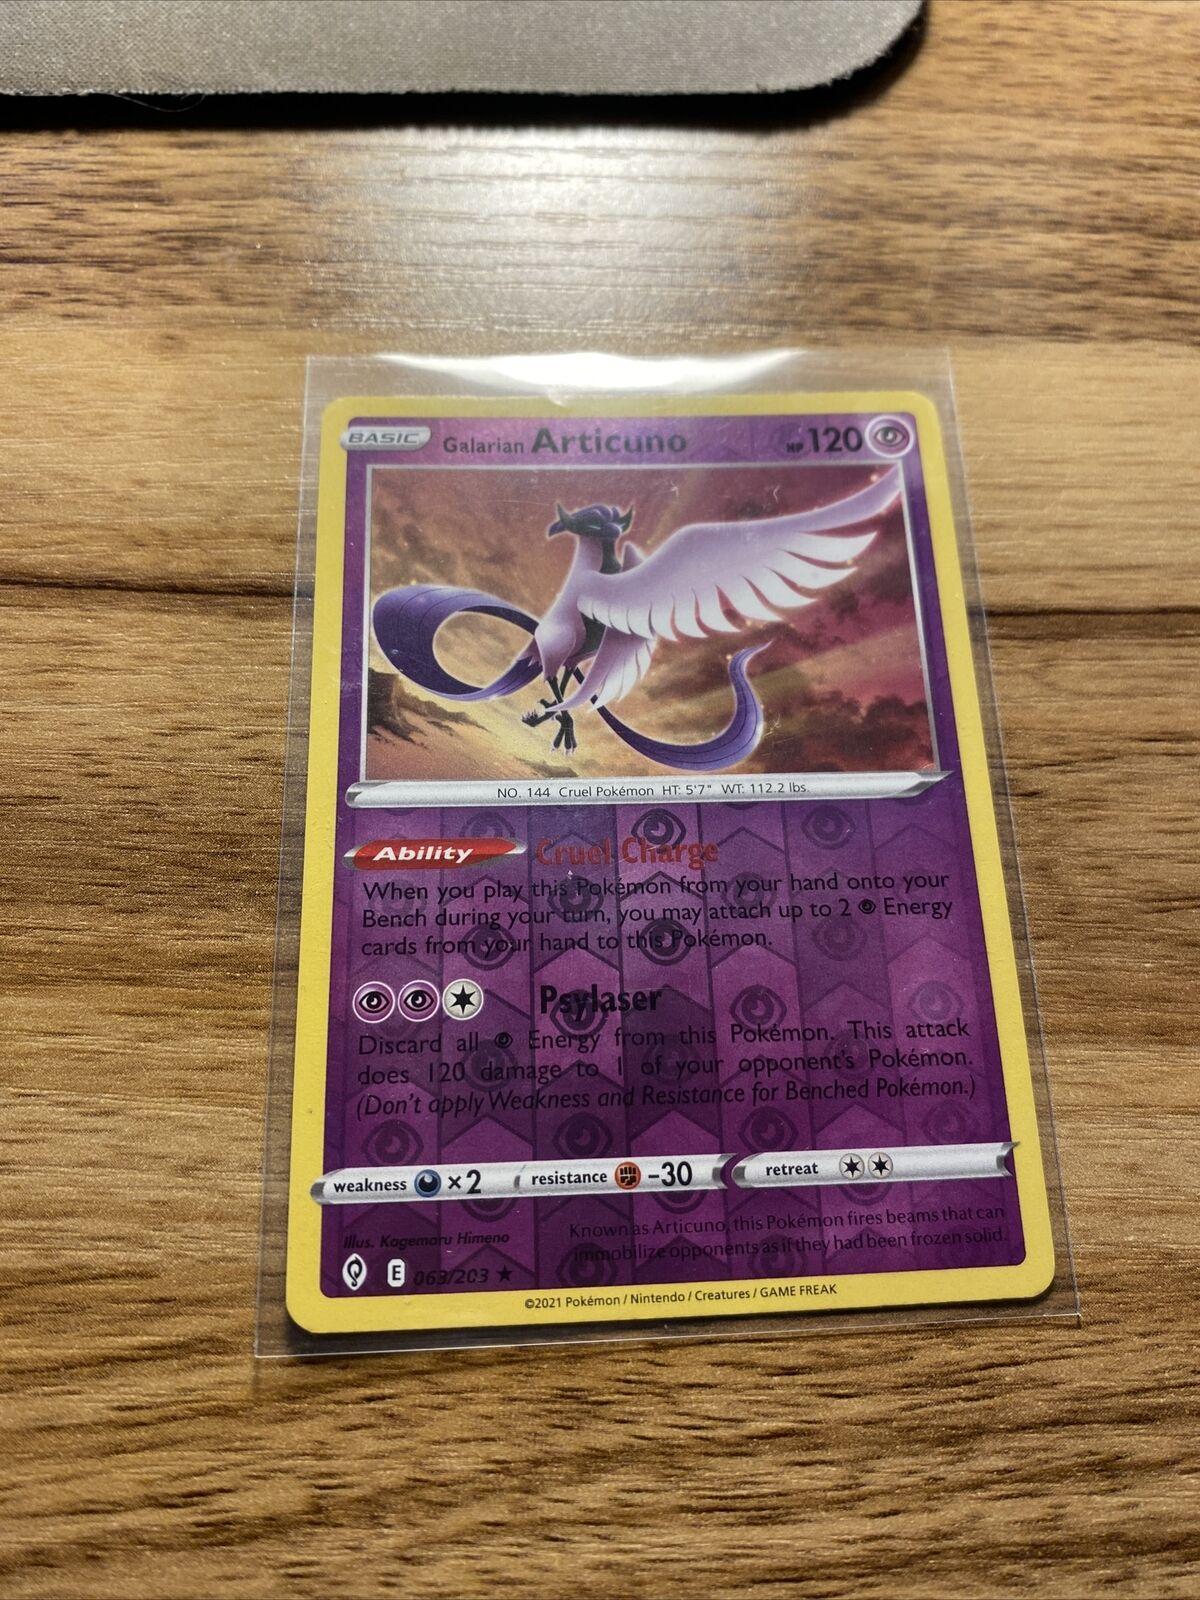 Galarian Articuno 063/203 - Evolving Skies - Reverse Holo Pokemon Card - NM